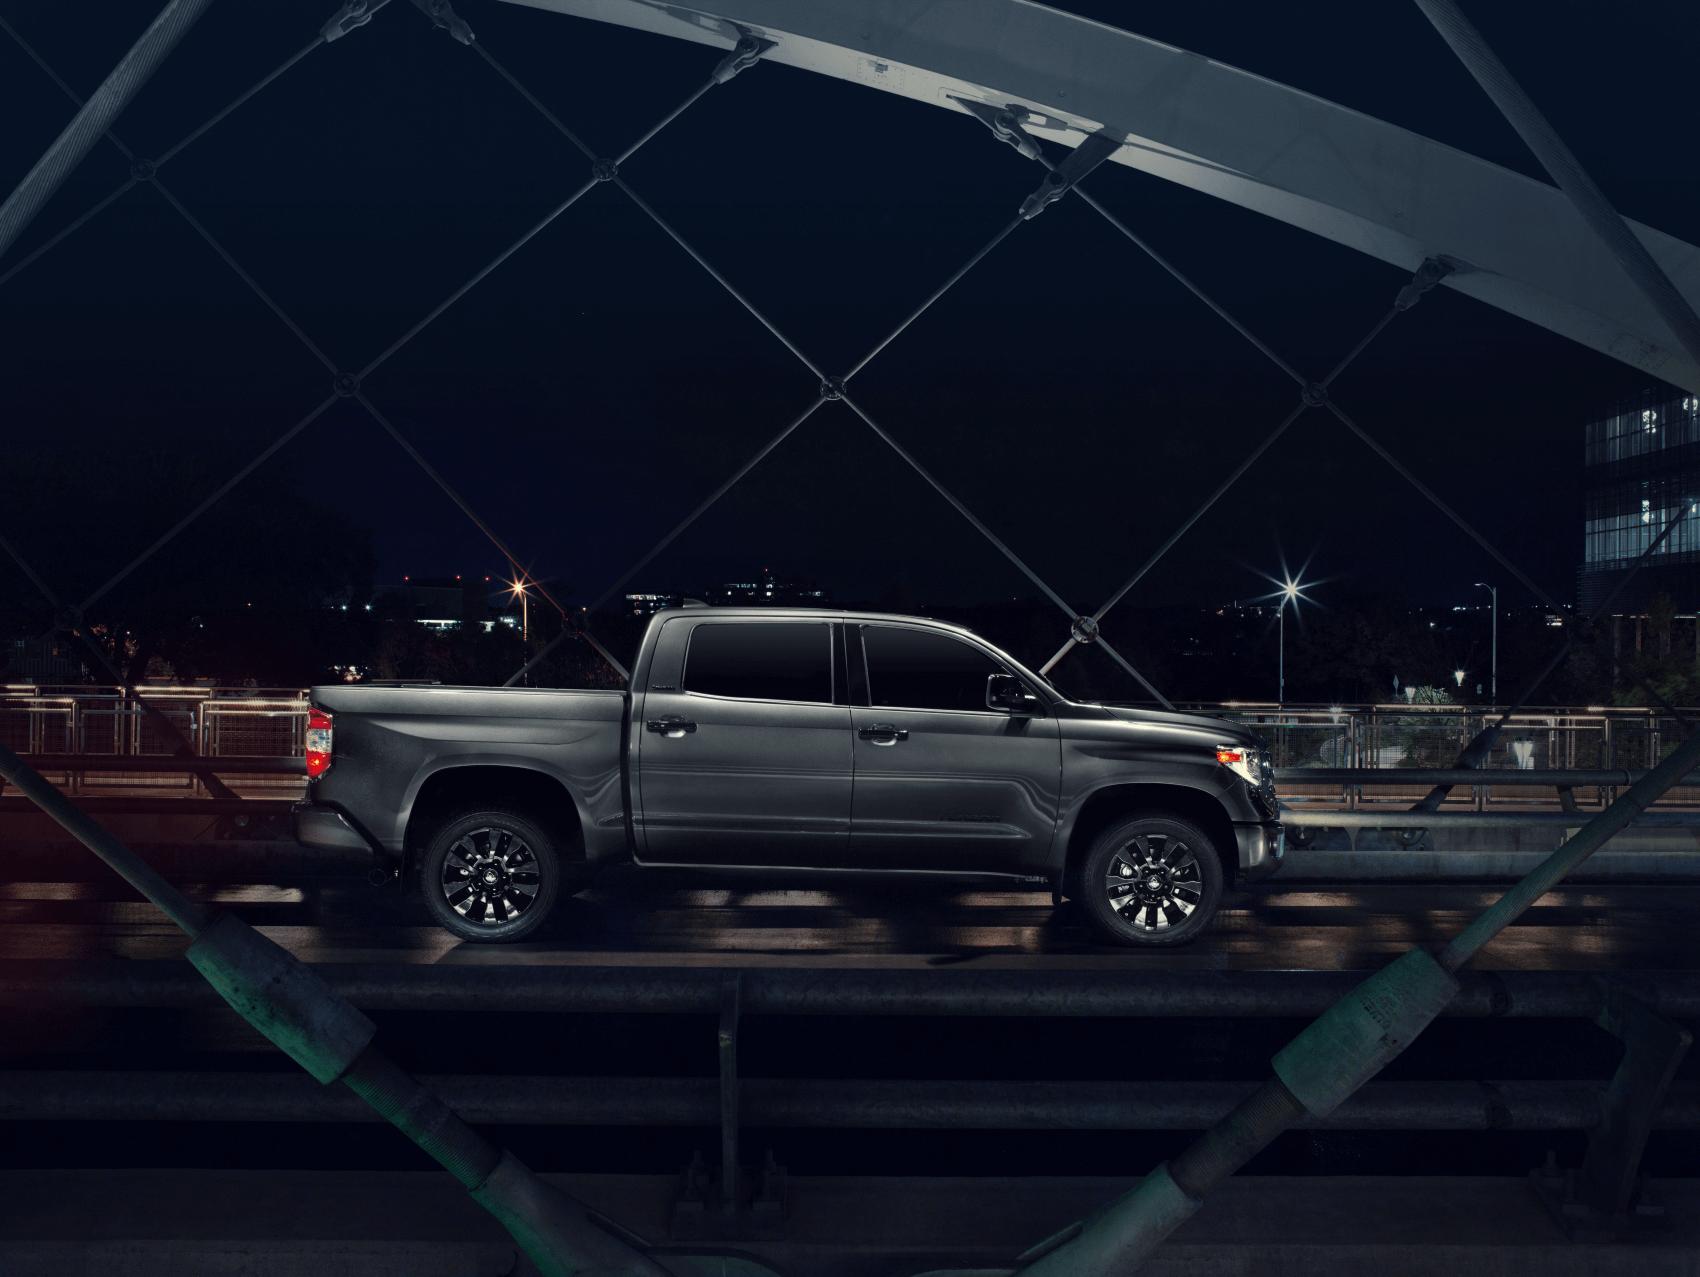 2021 Toyota Tundra Gray Night Bridge